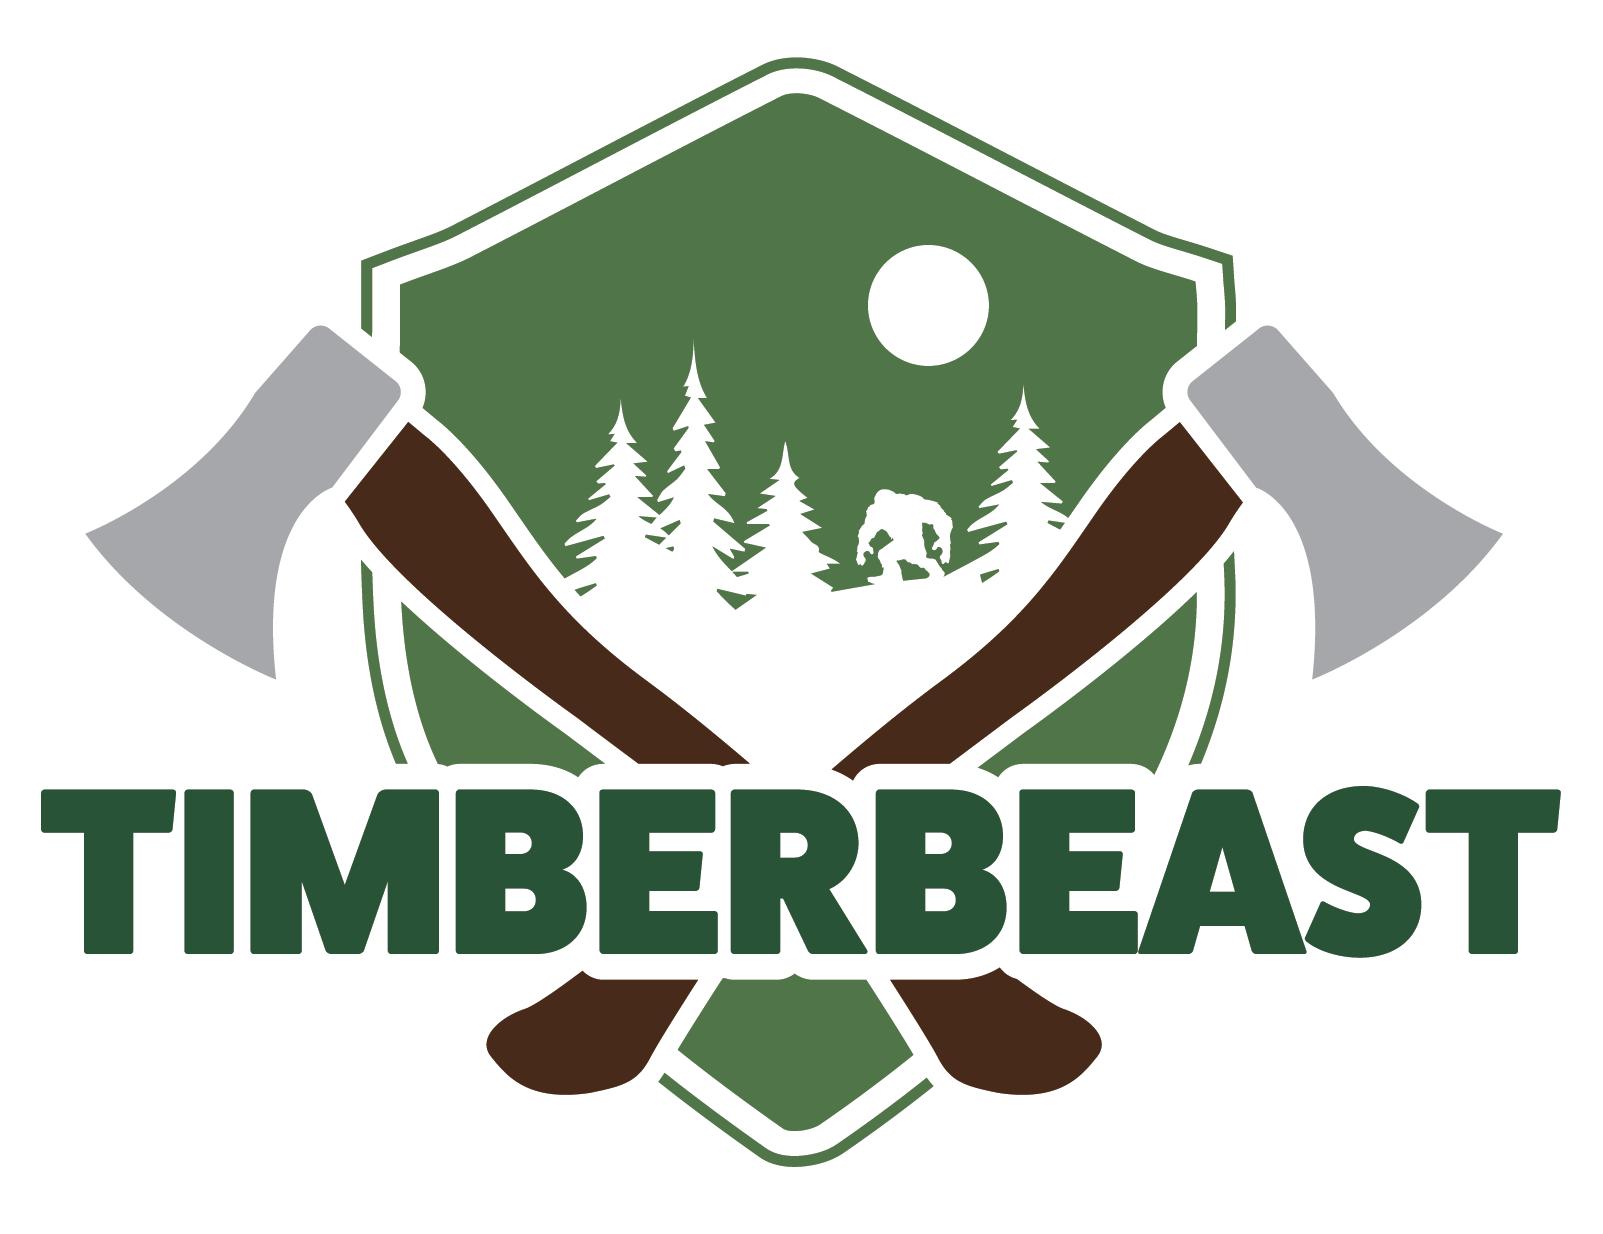 TimberBeast Axe Throwing